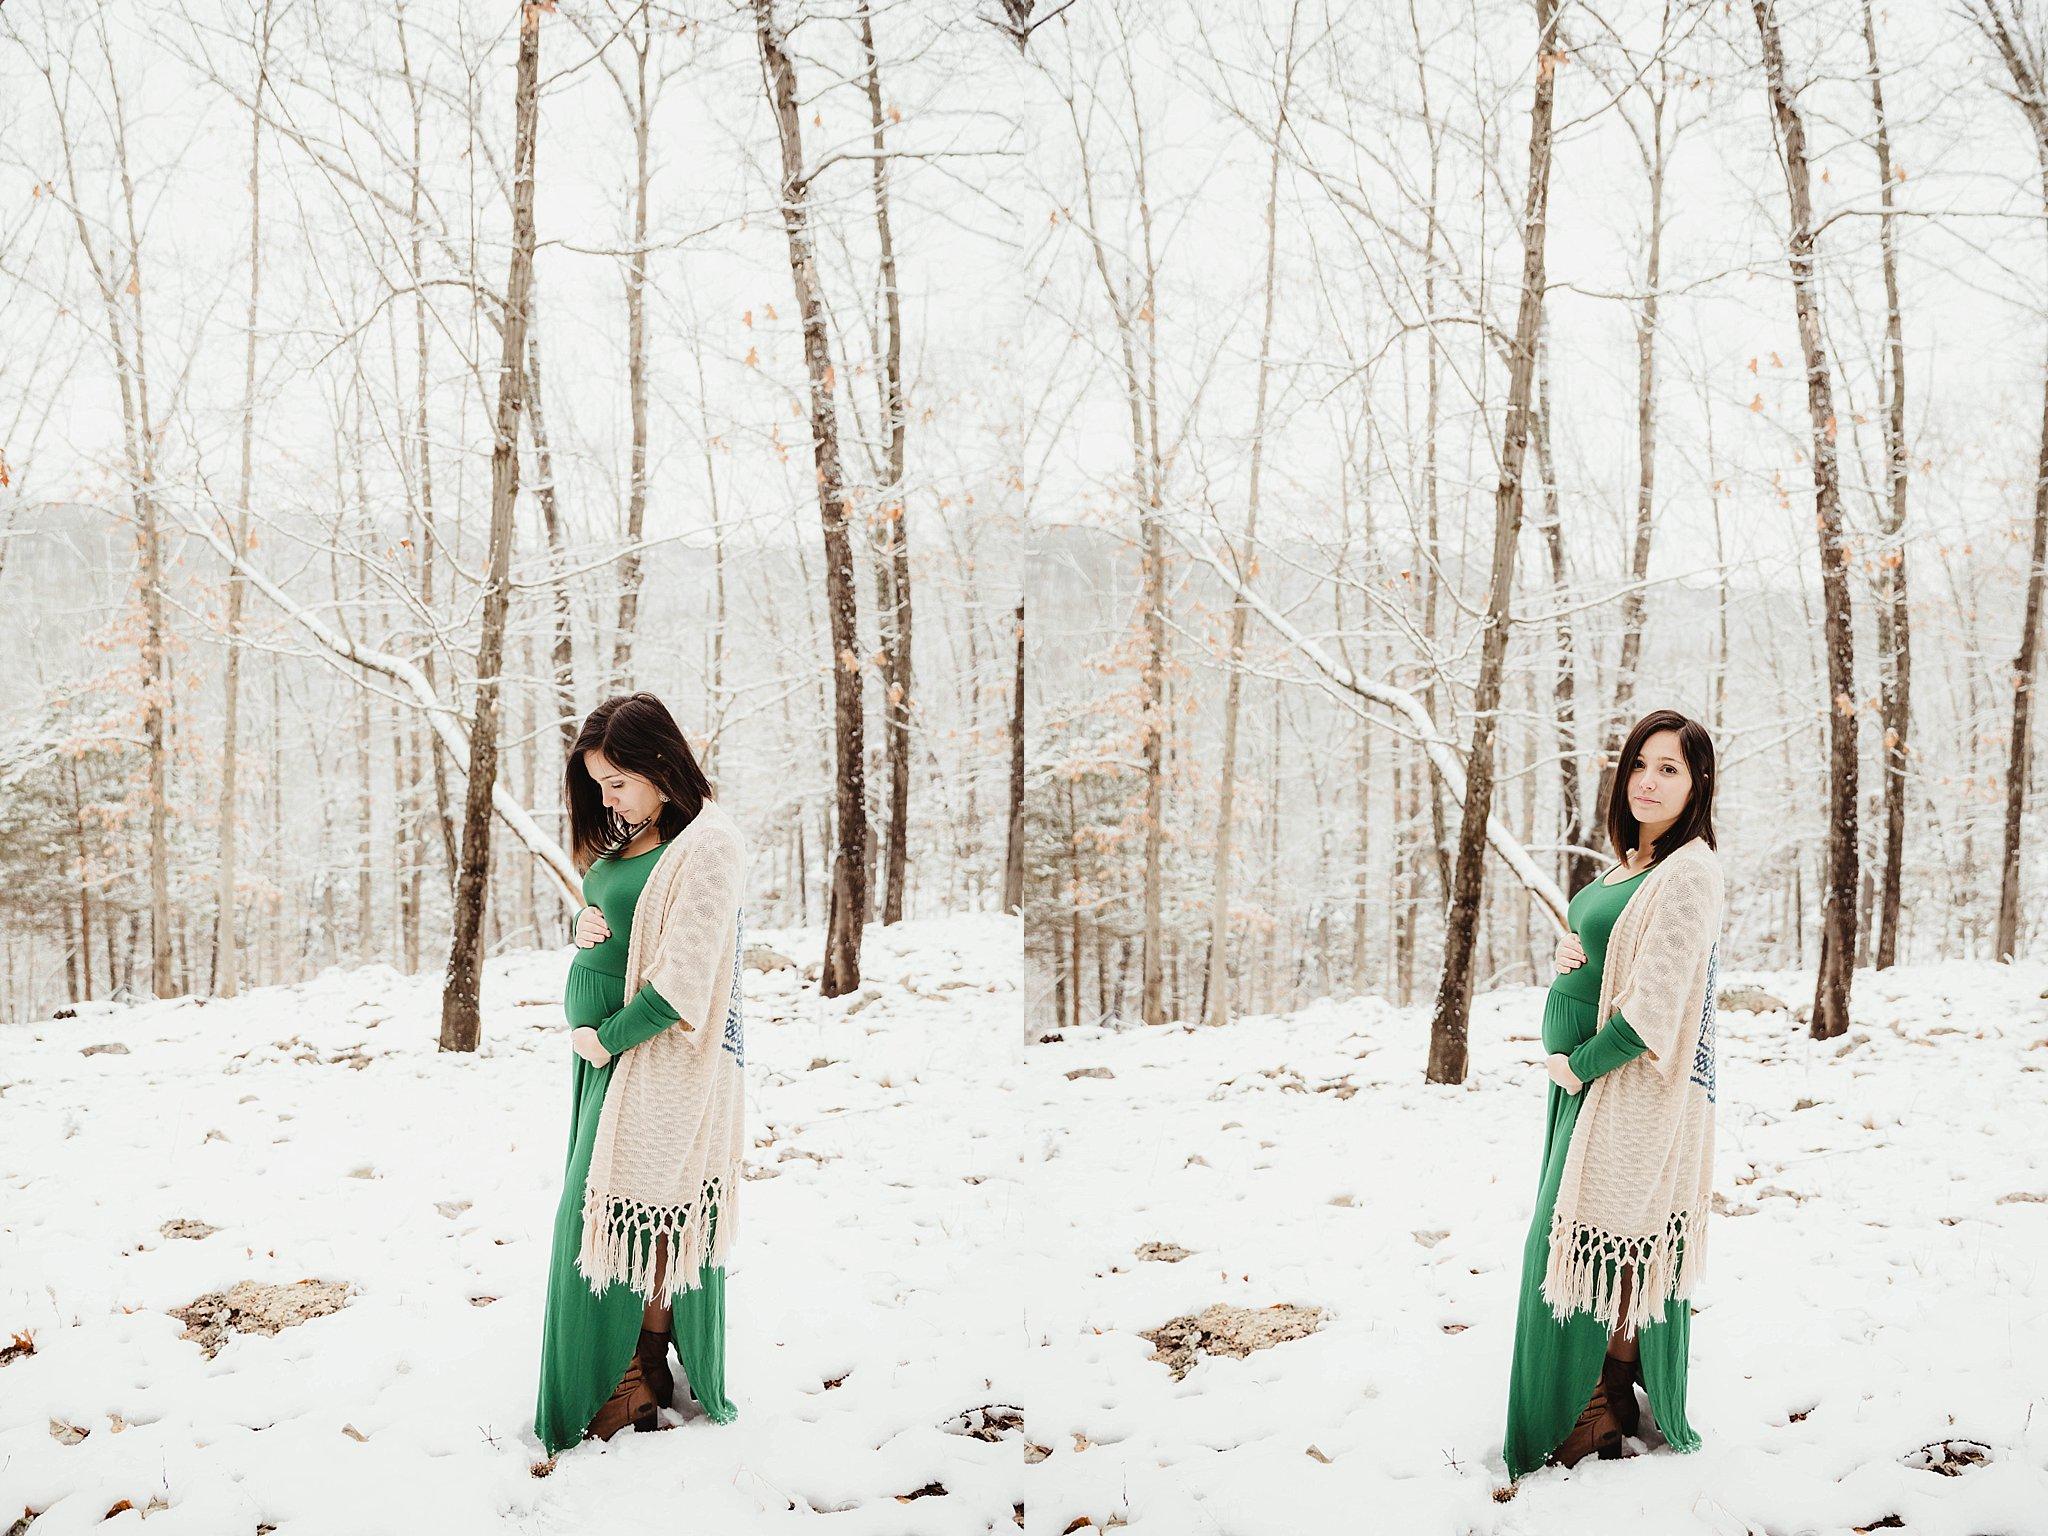 20181227-maternity-photo-outdoor-snow-newborn-picture-best-baby-photographer-missouri-camdenton-01.jpg